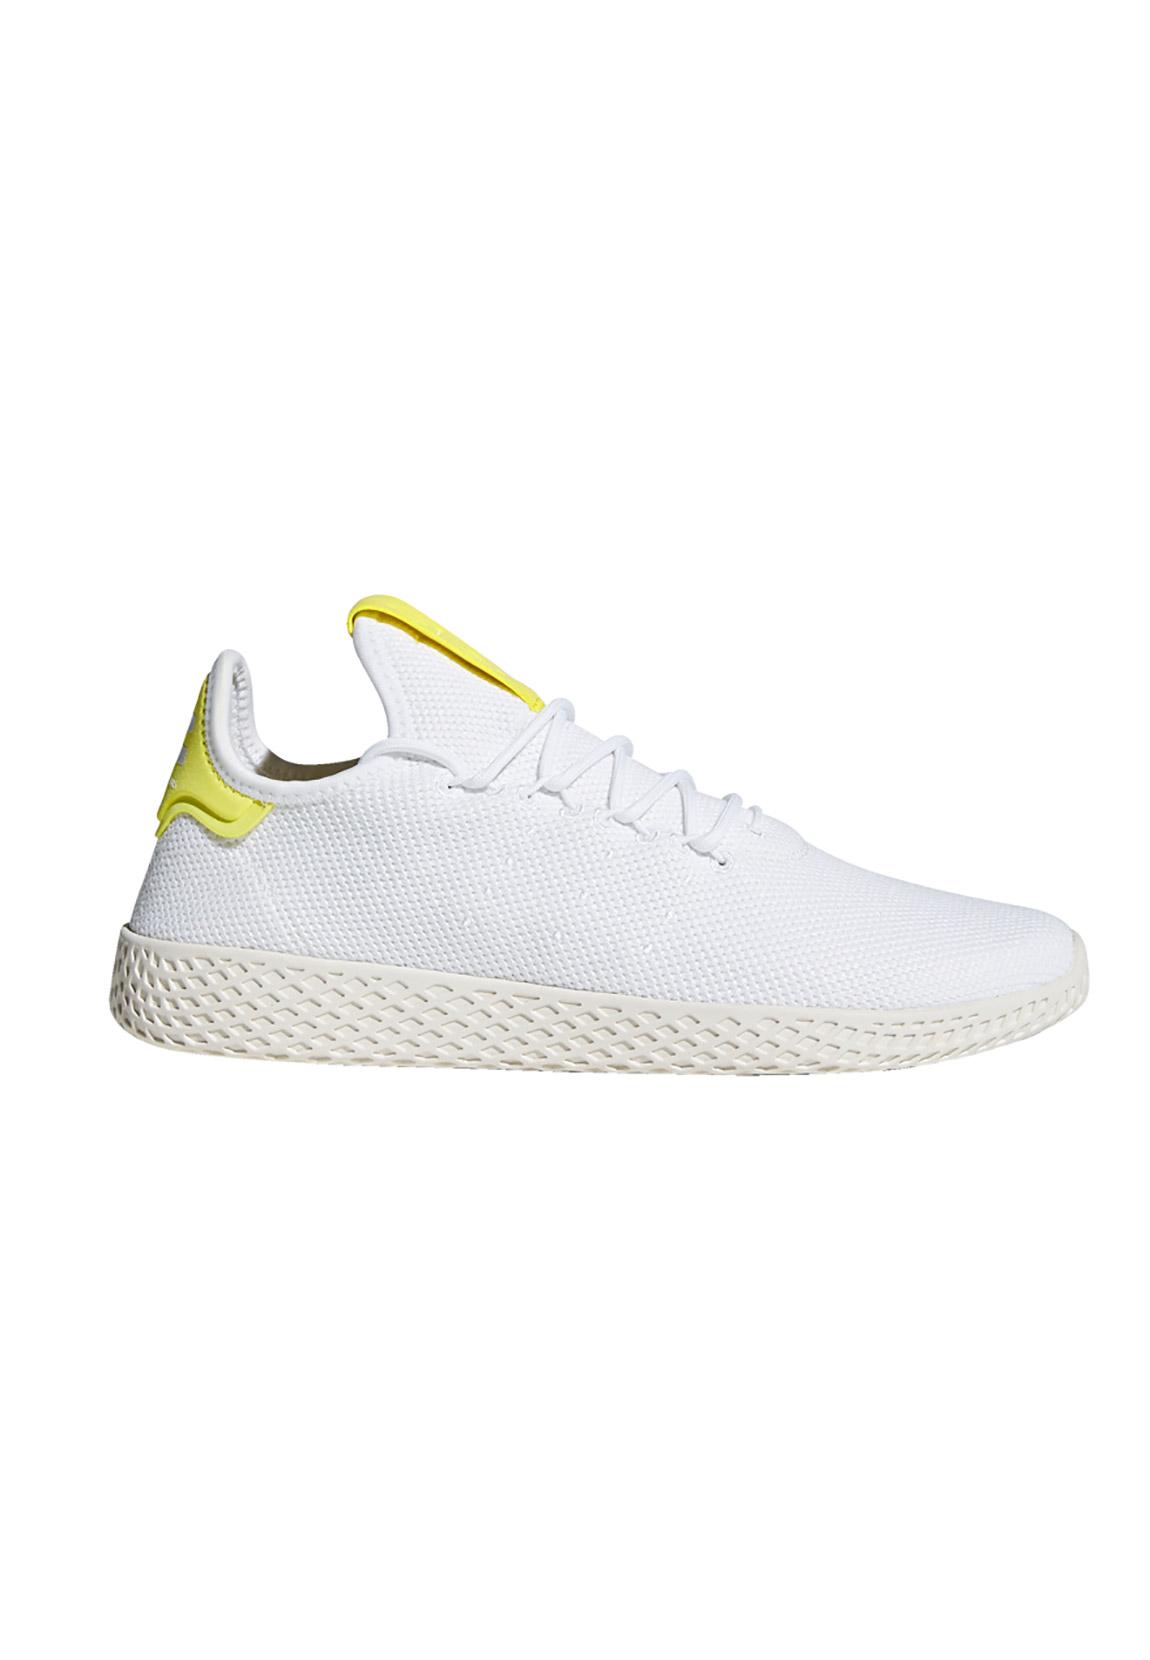 ADIDAS ORIGINALE Sneakers PW TENNIS HU b41806 BIANCO GIALLO